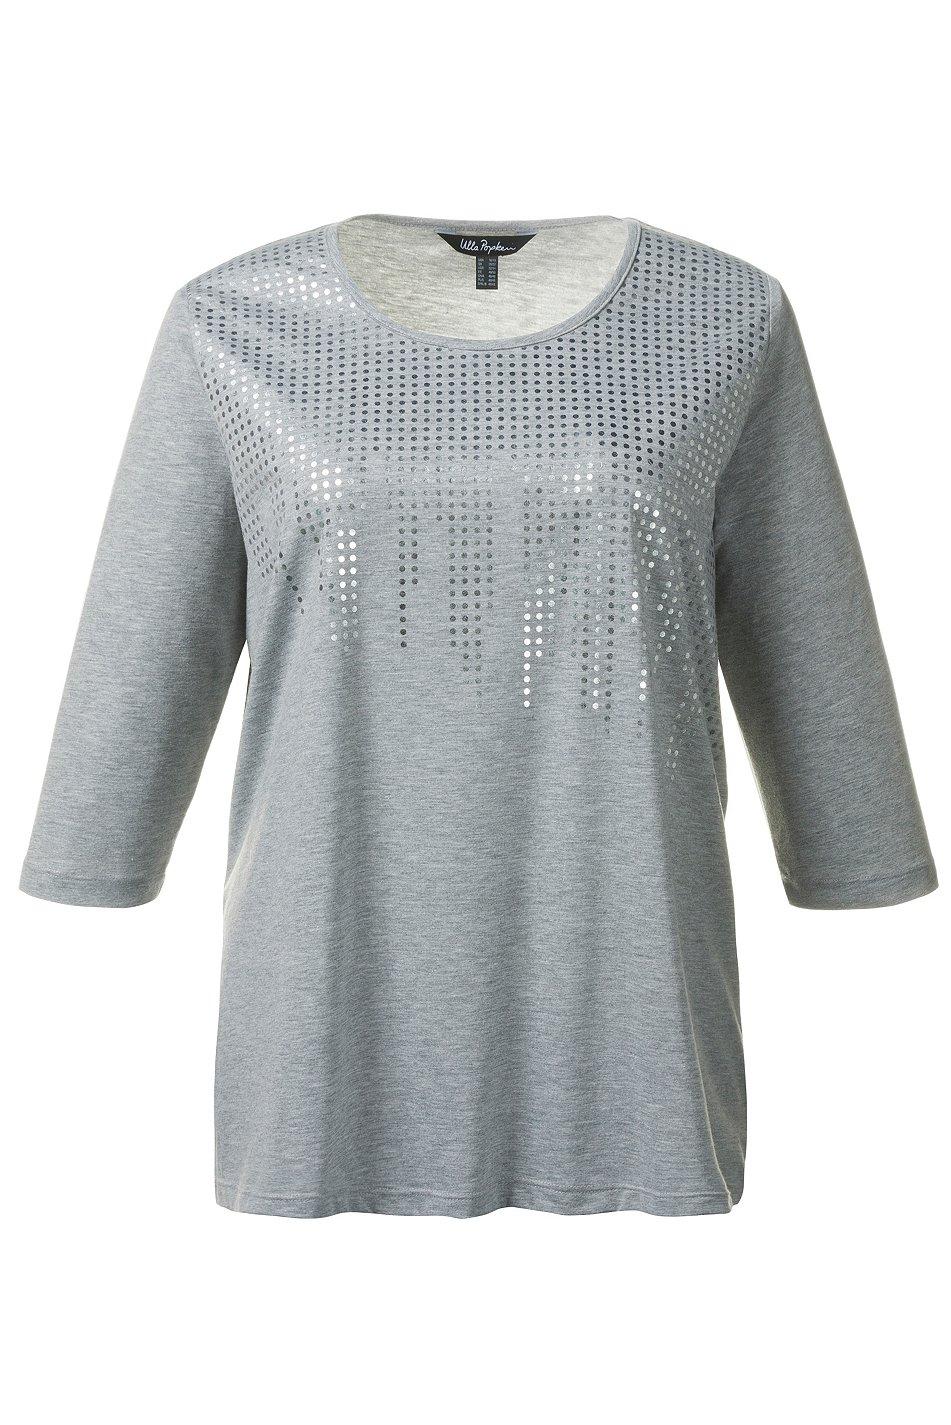 ulla popken 3 4 arm shirt mit glitter print hellgrau neu. Black Bedroom Furniture Sets. Home Design Ideas